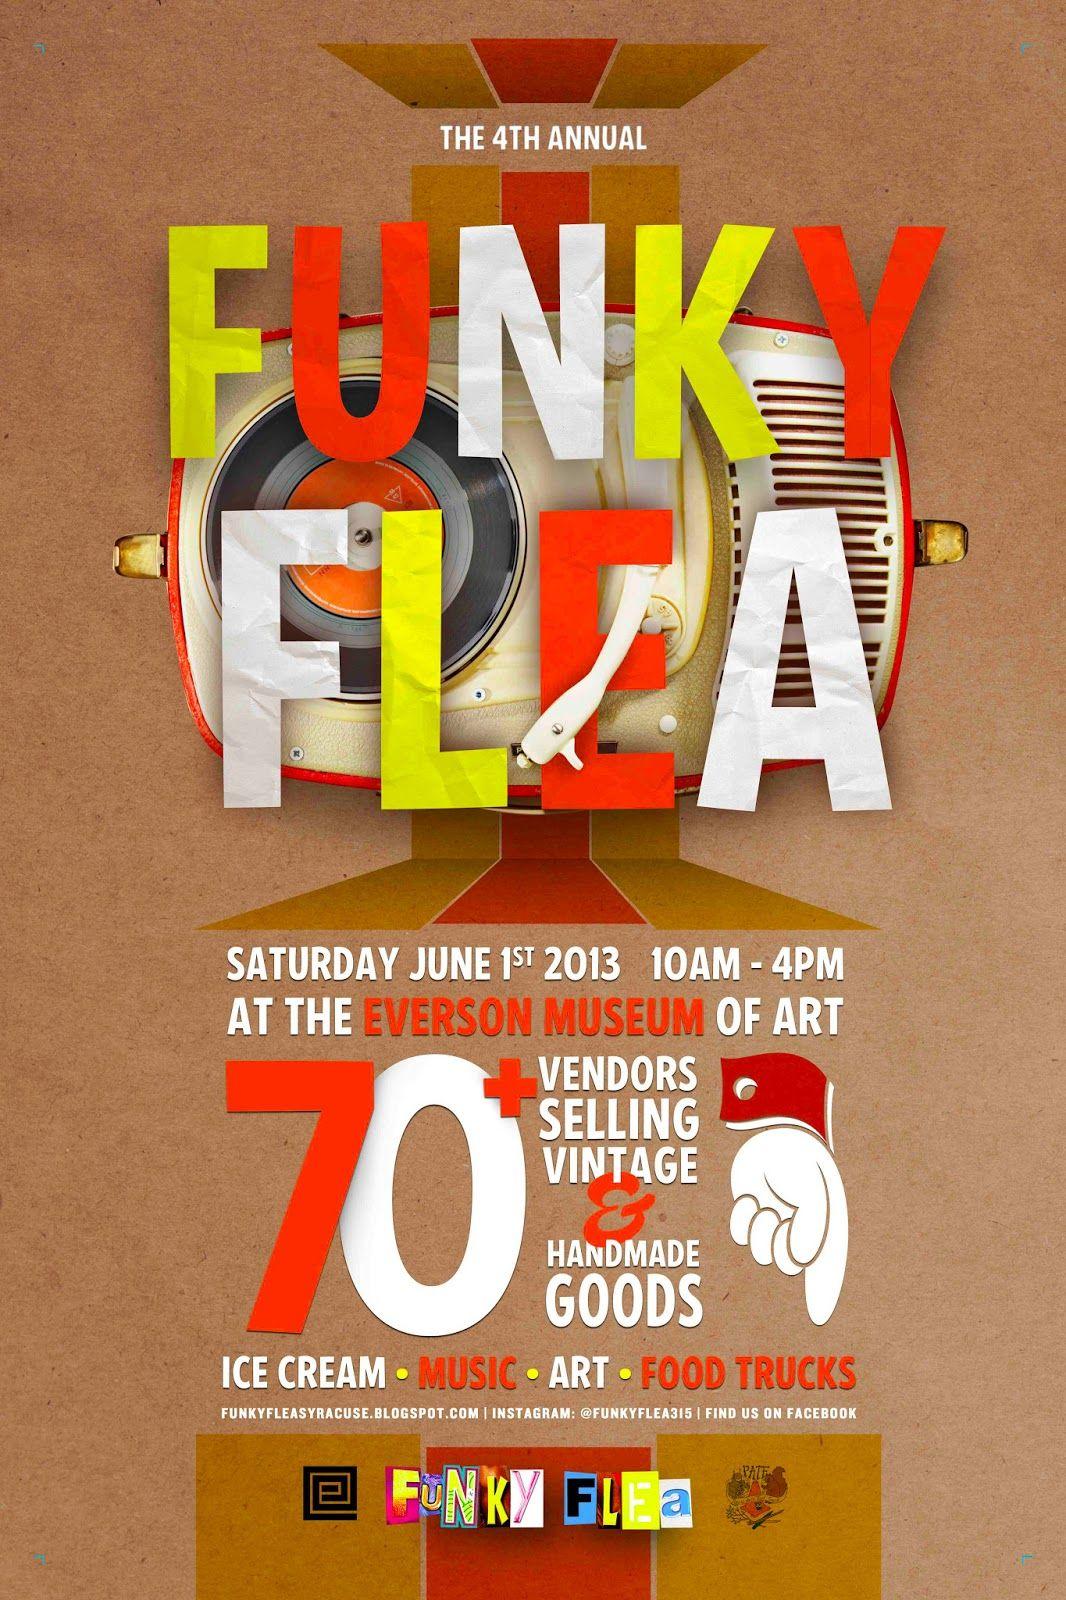 Pin By Diana Danbi Oh On Design Everywhere Flea Market Poster Design Graphic Design Ads Flea Market Poster Flea market flyer template free